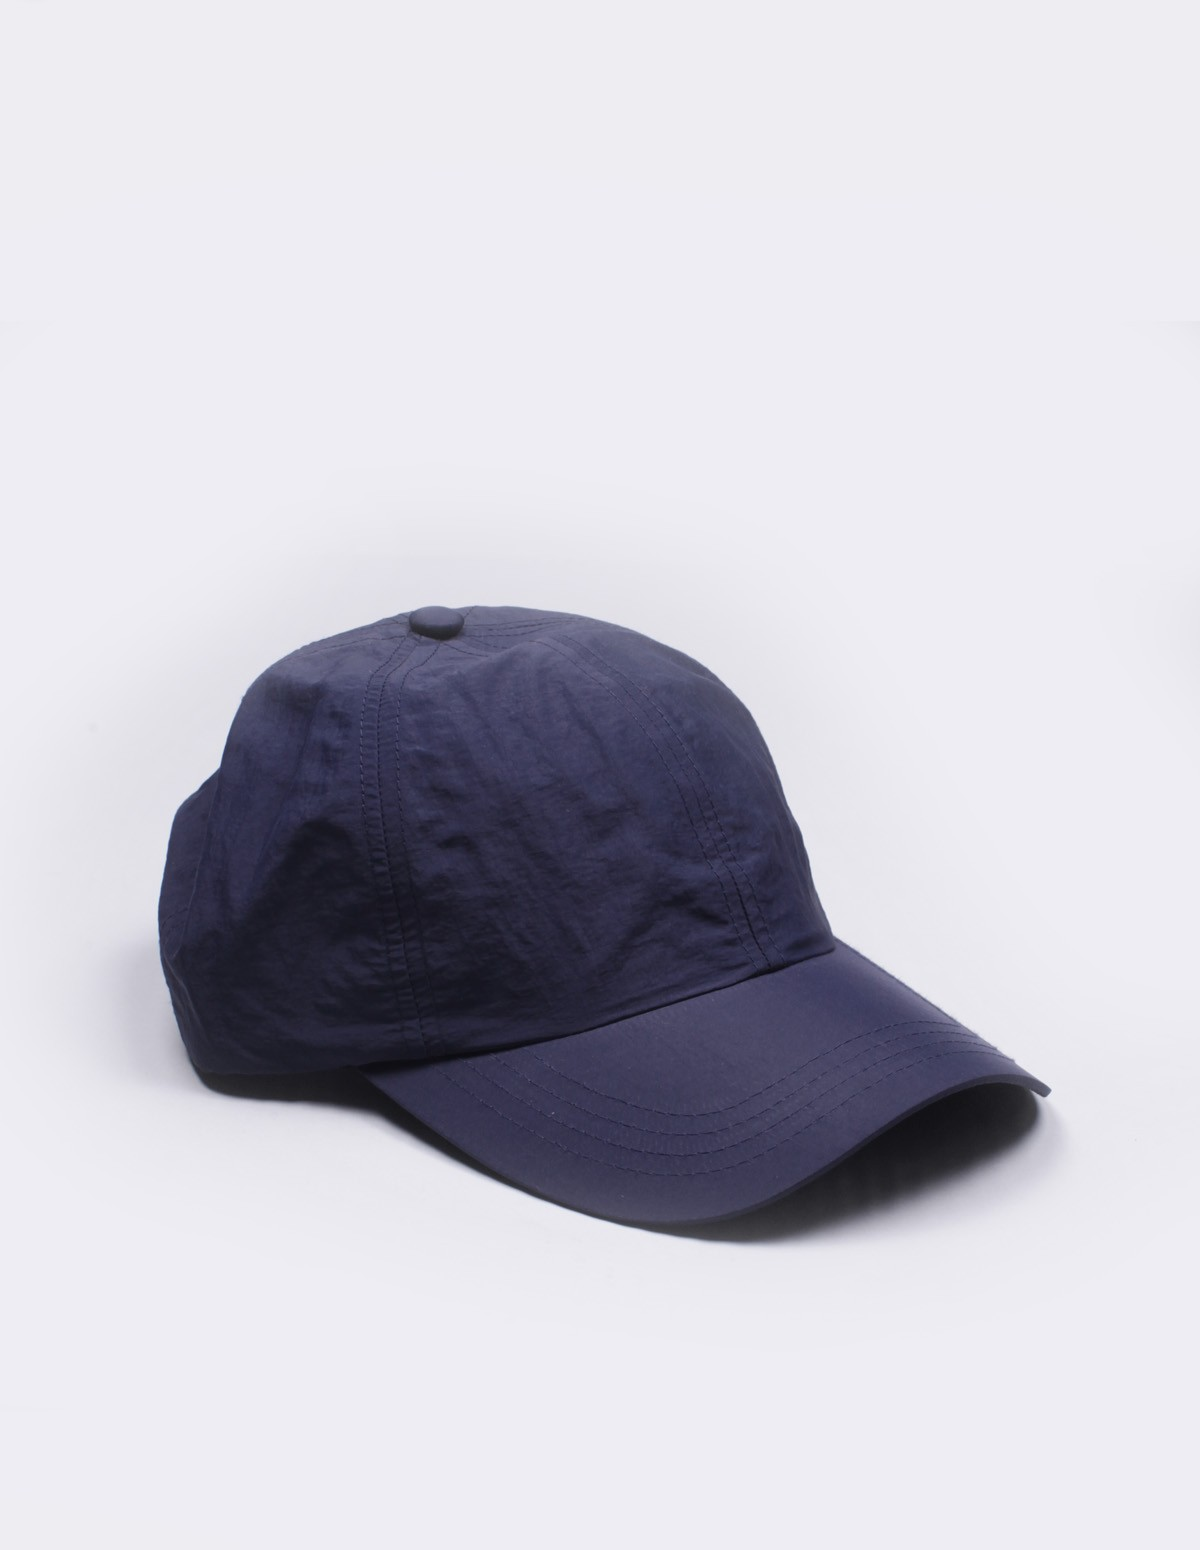 Nn07 Nylon Cap 9153 - NAVY 200